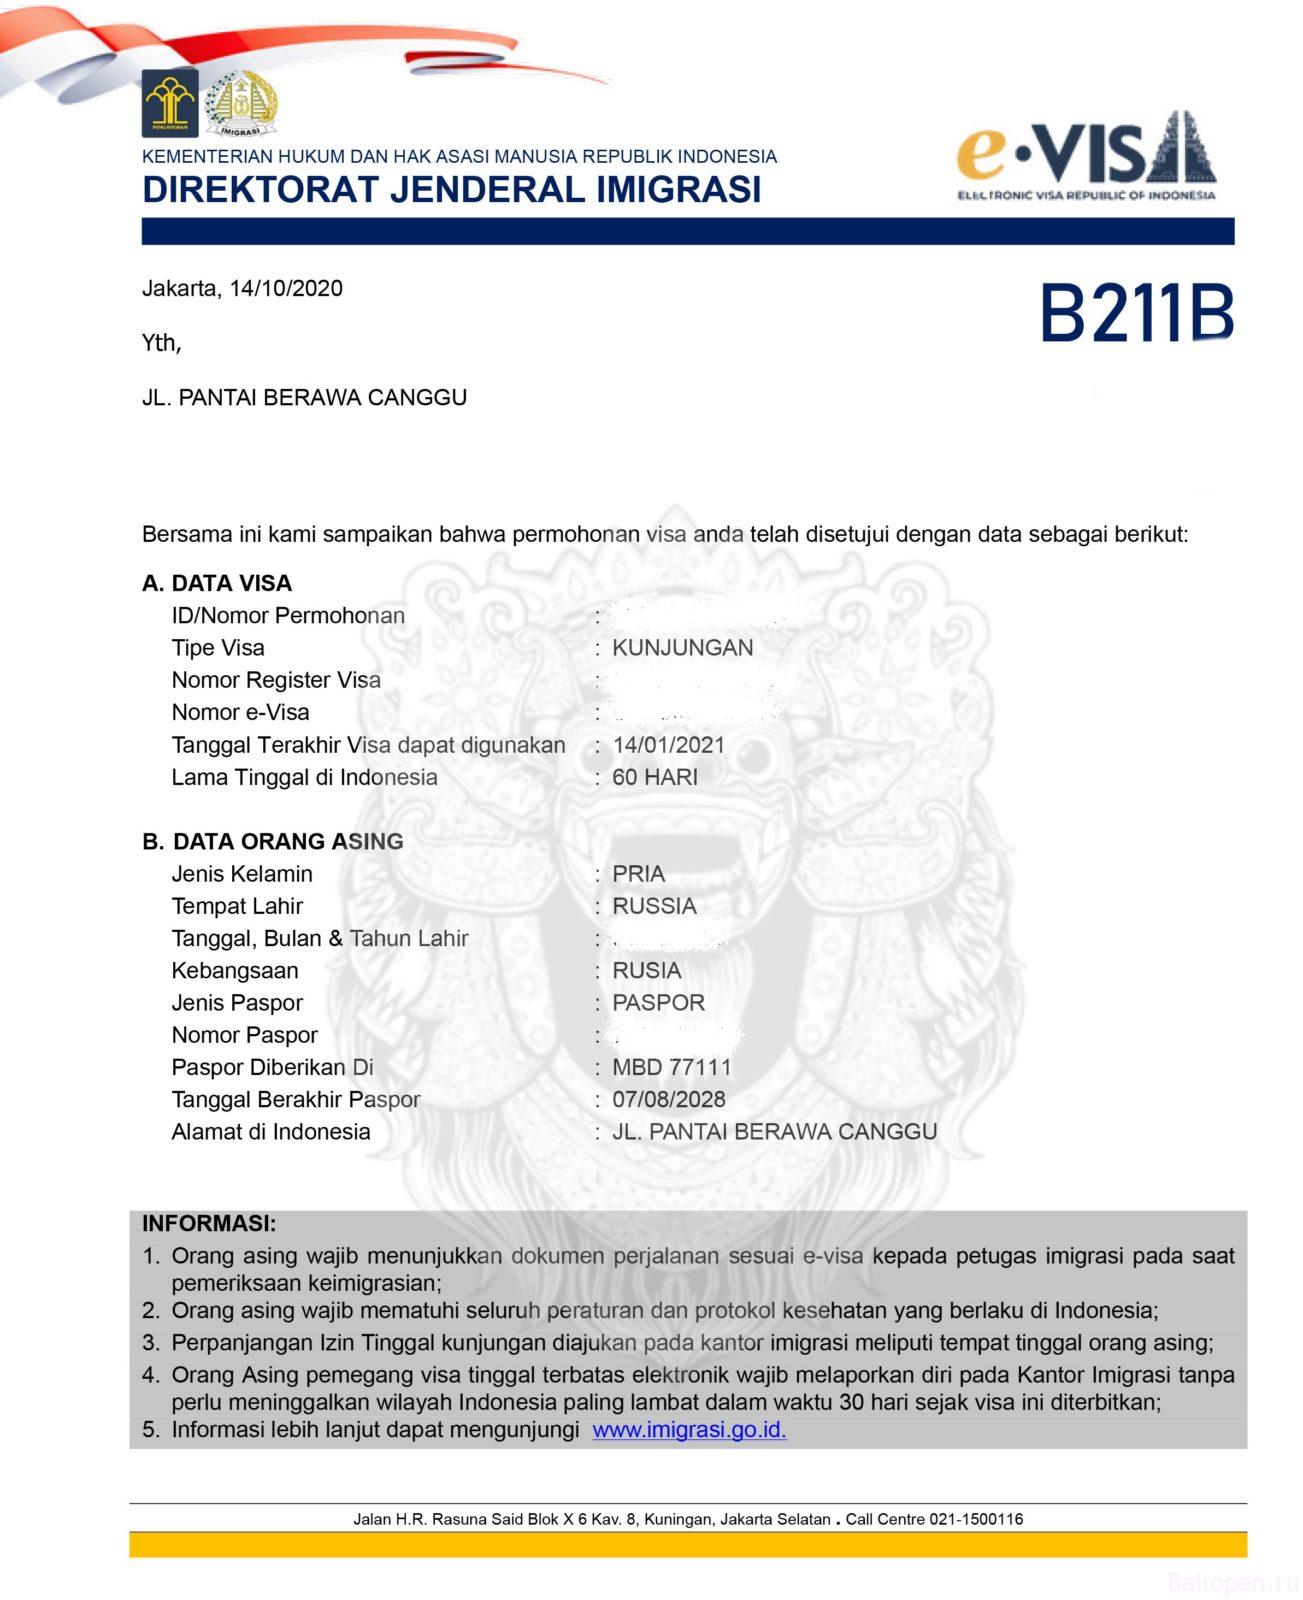 evisa_indinesia_bali электорнная виза на Бали в Индонезию